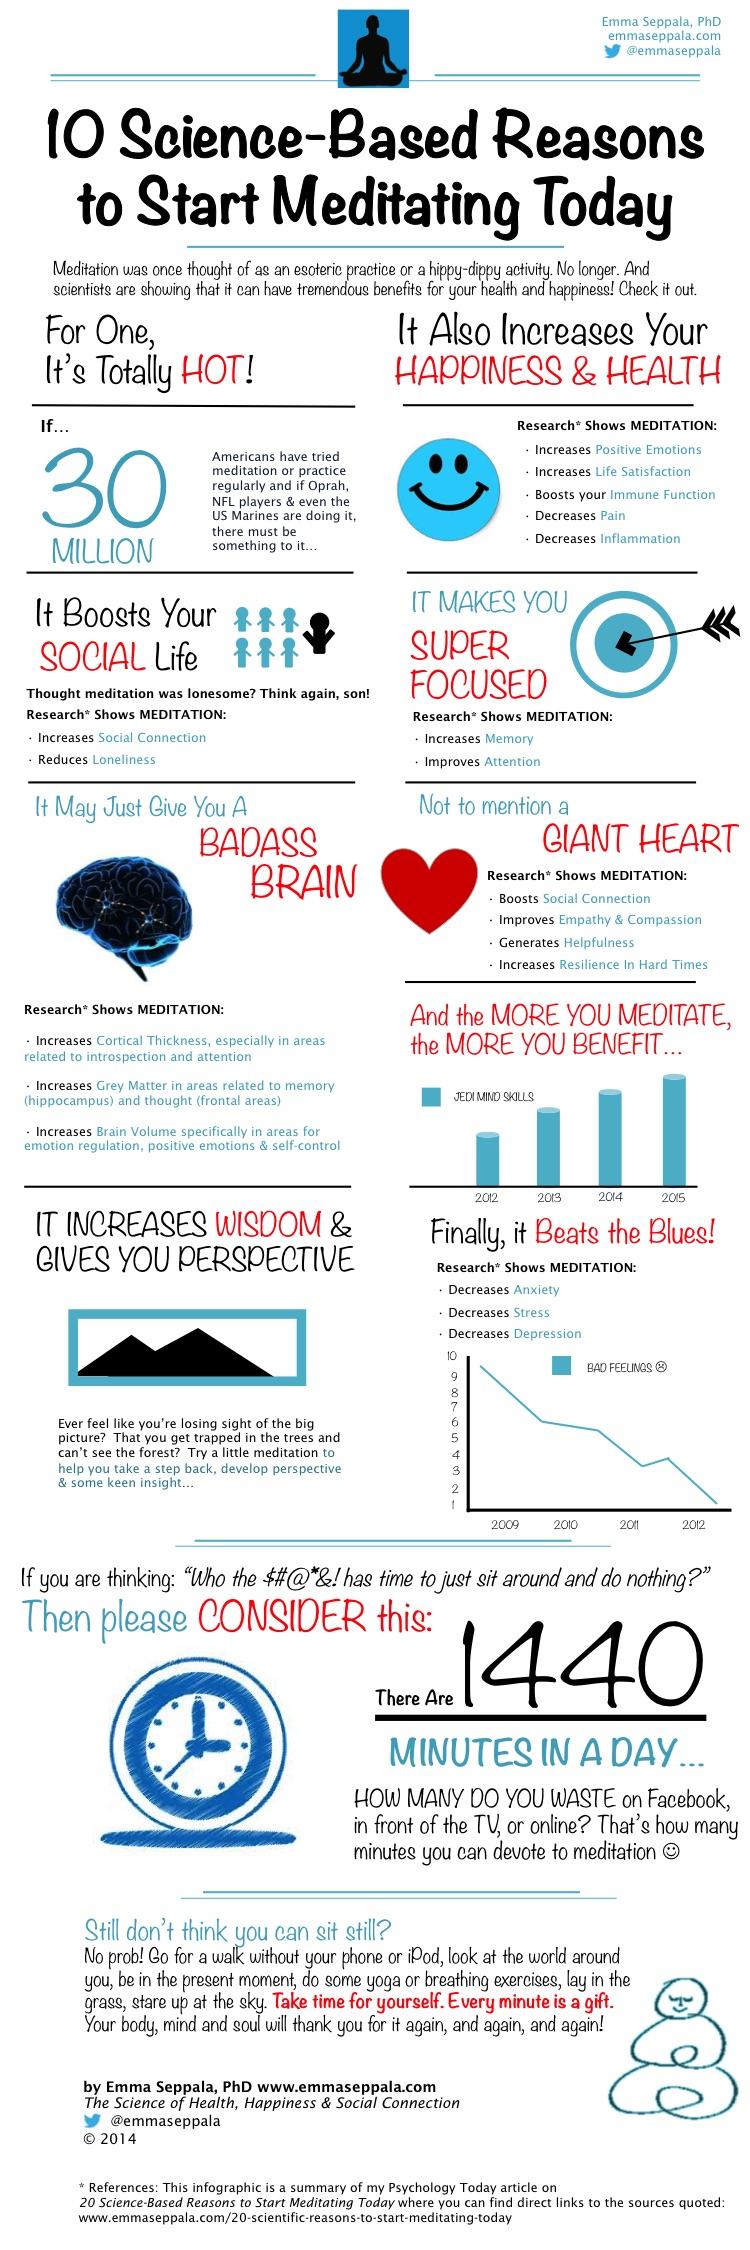 Infographic curtesy of Emma Seppala @ Emmaseppala.com.